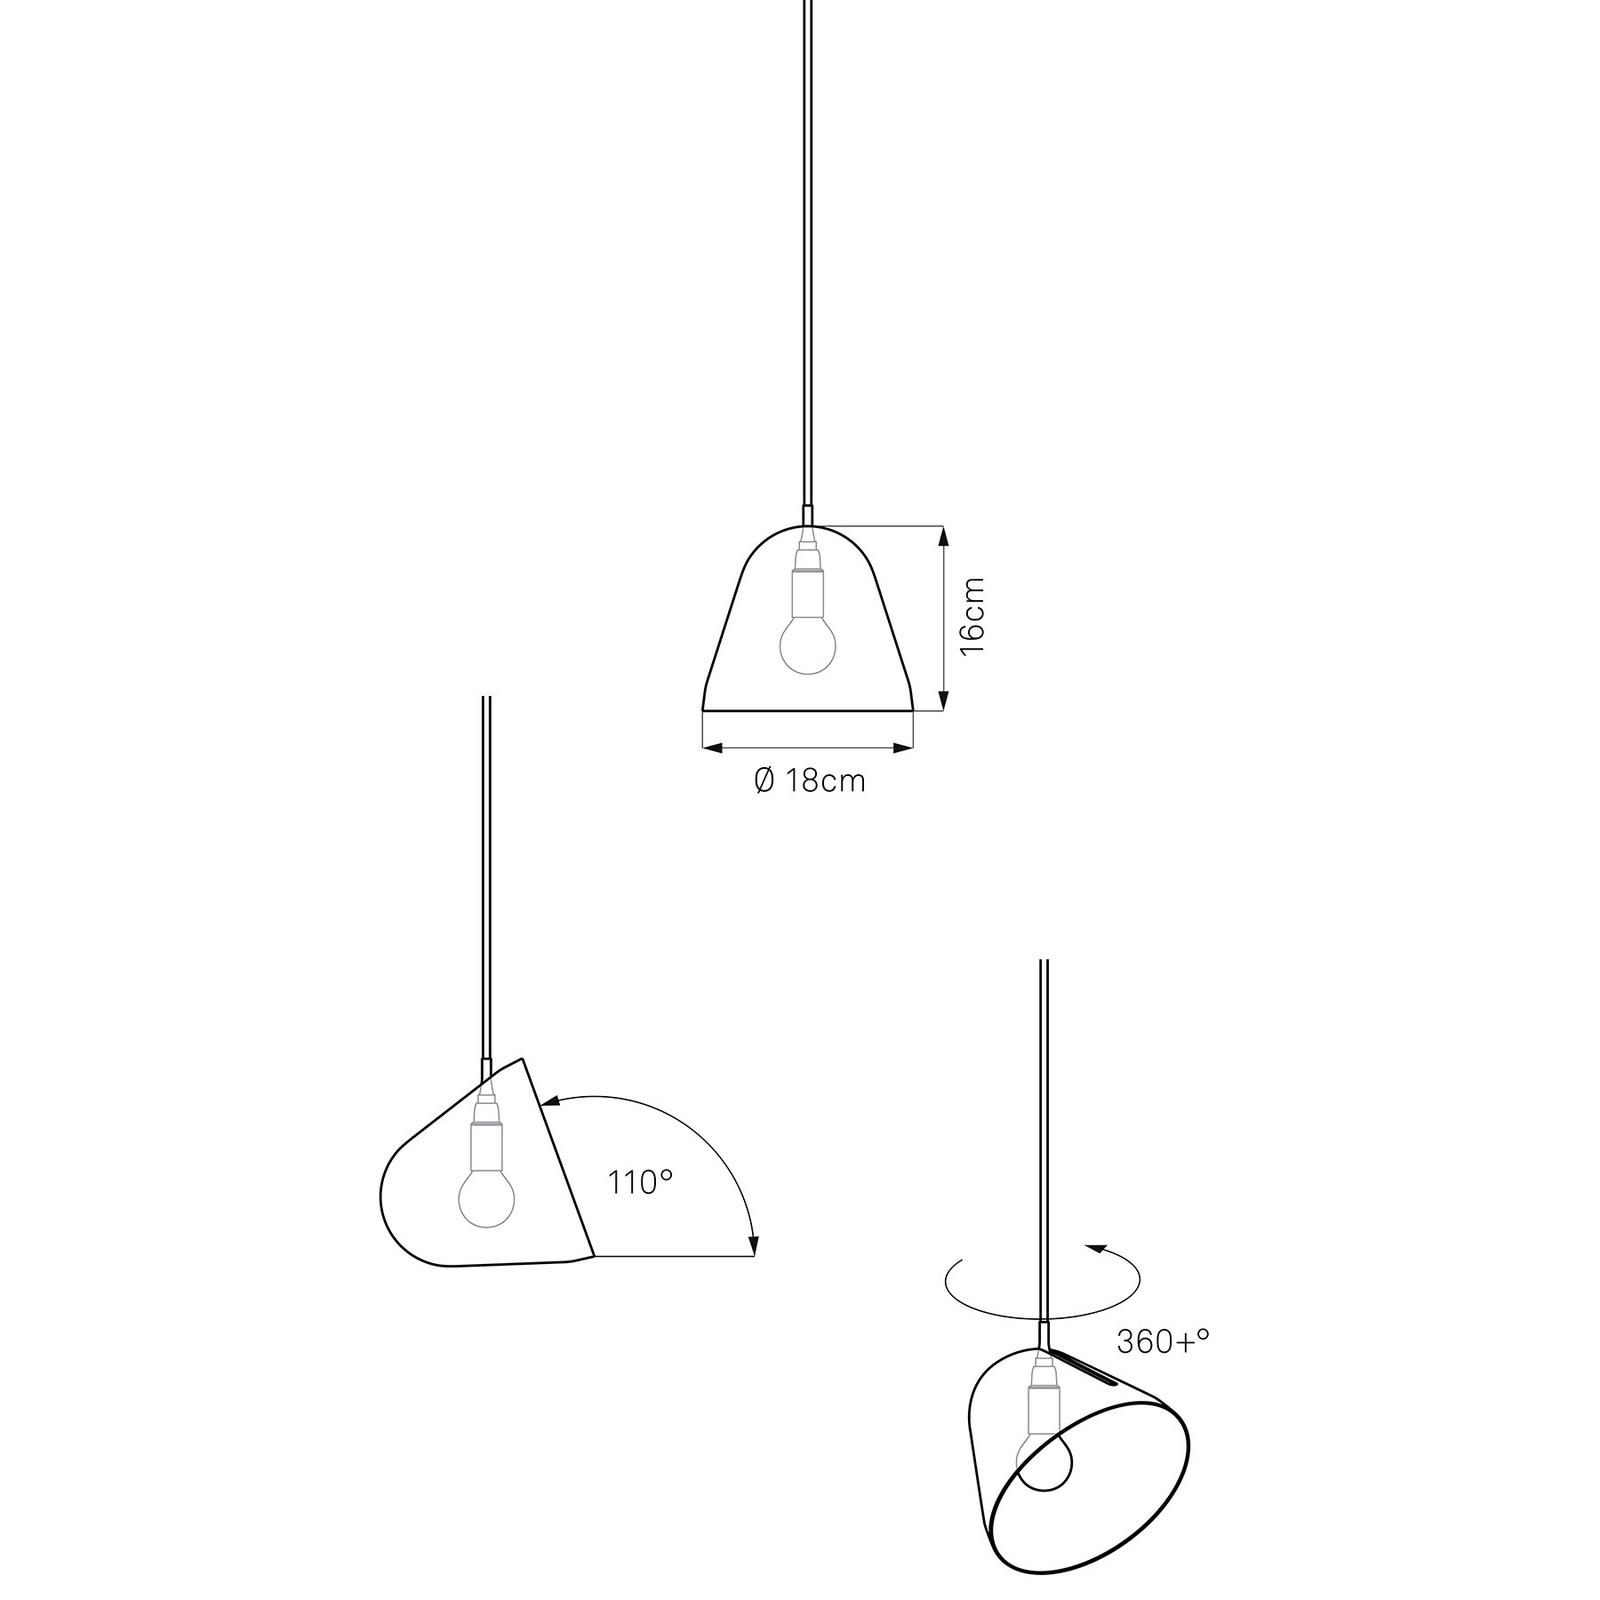 Nyta Tilt S hanglamp kabel 3m rood, grijs